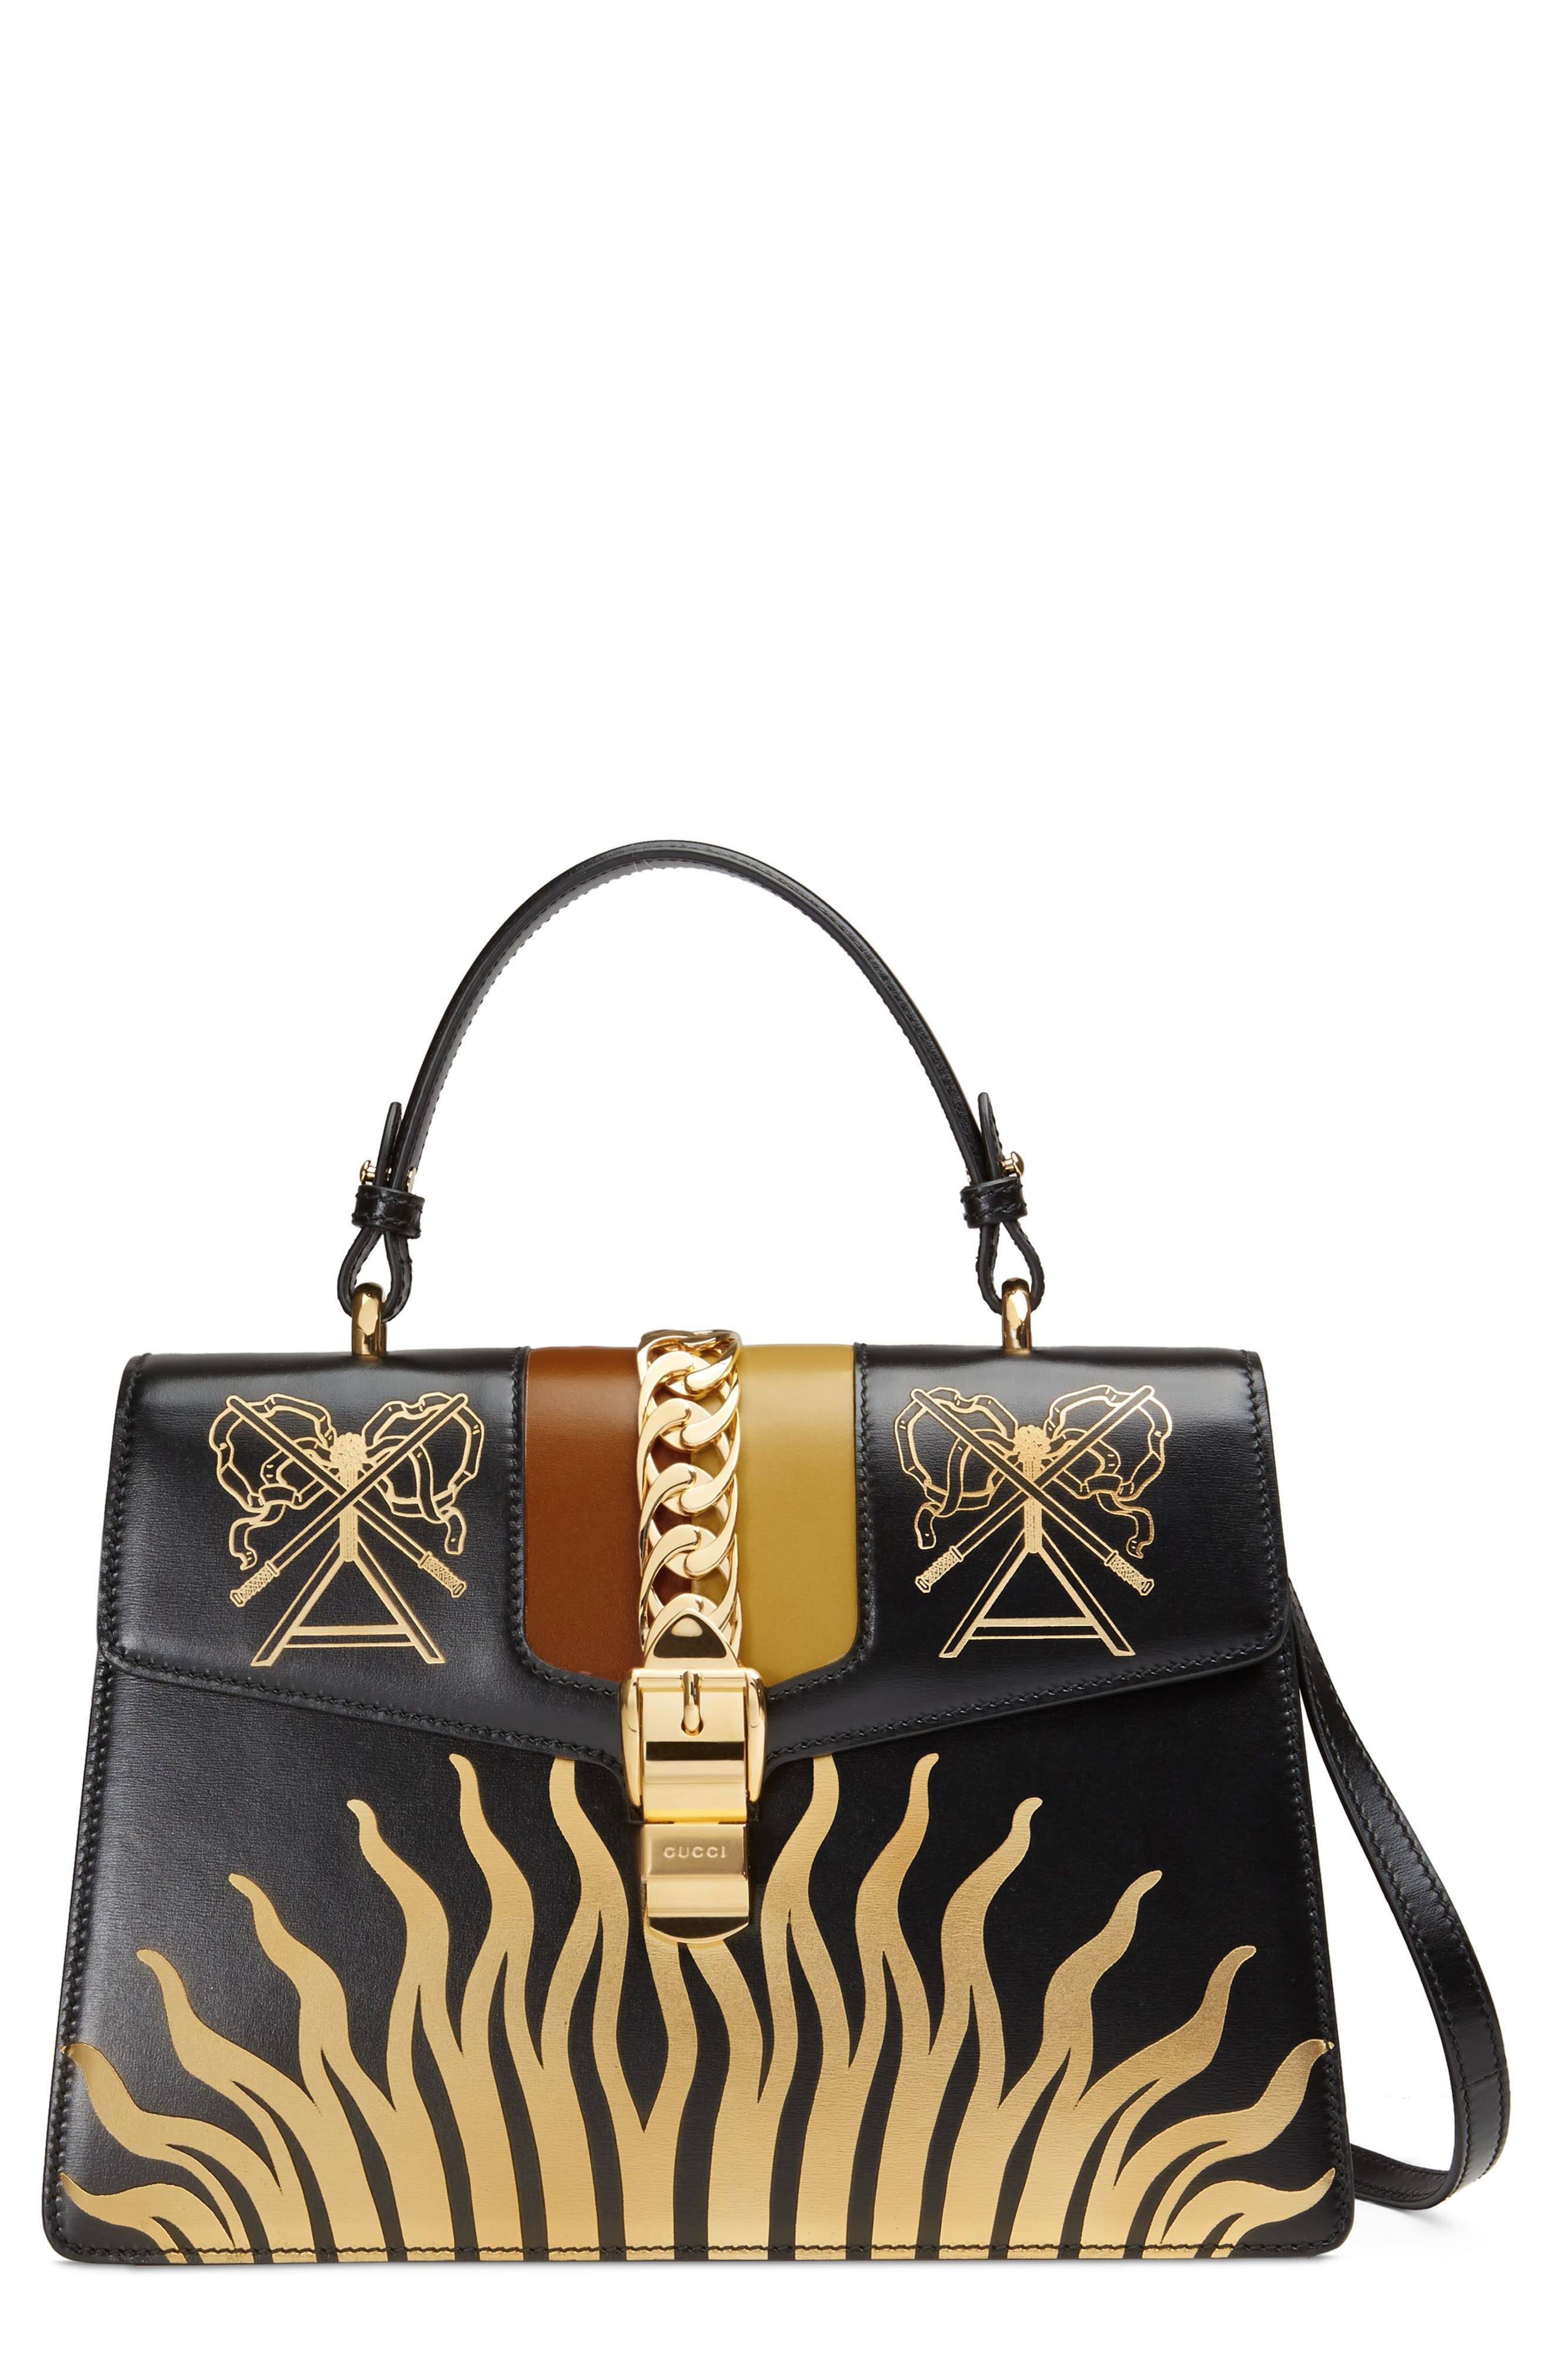 Medium Sylvie Top Handle Leather Bag,                         Main,                         color, BLACK GOLD/ CARAMEL/ OCHRE